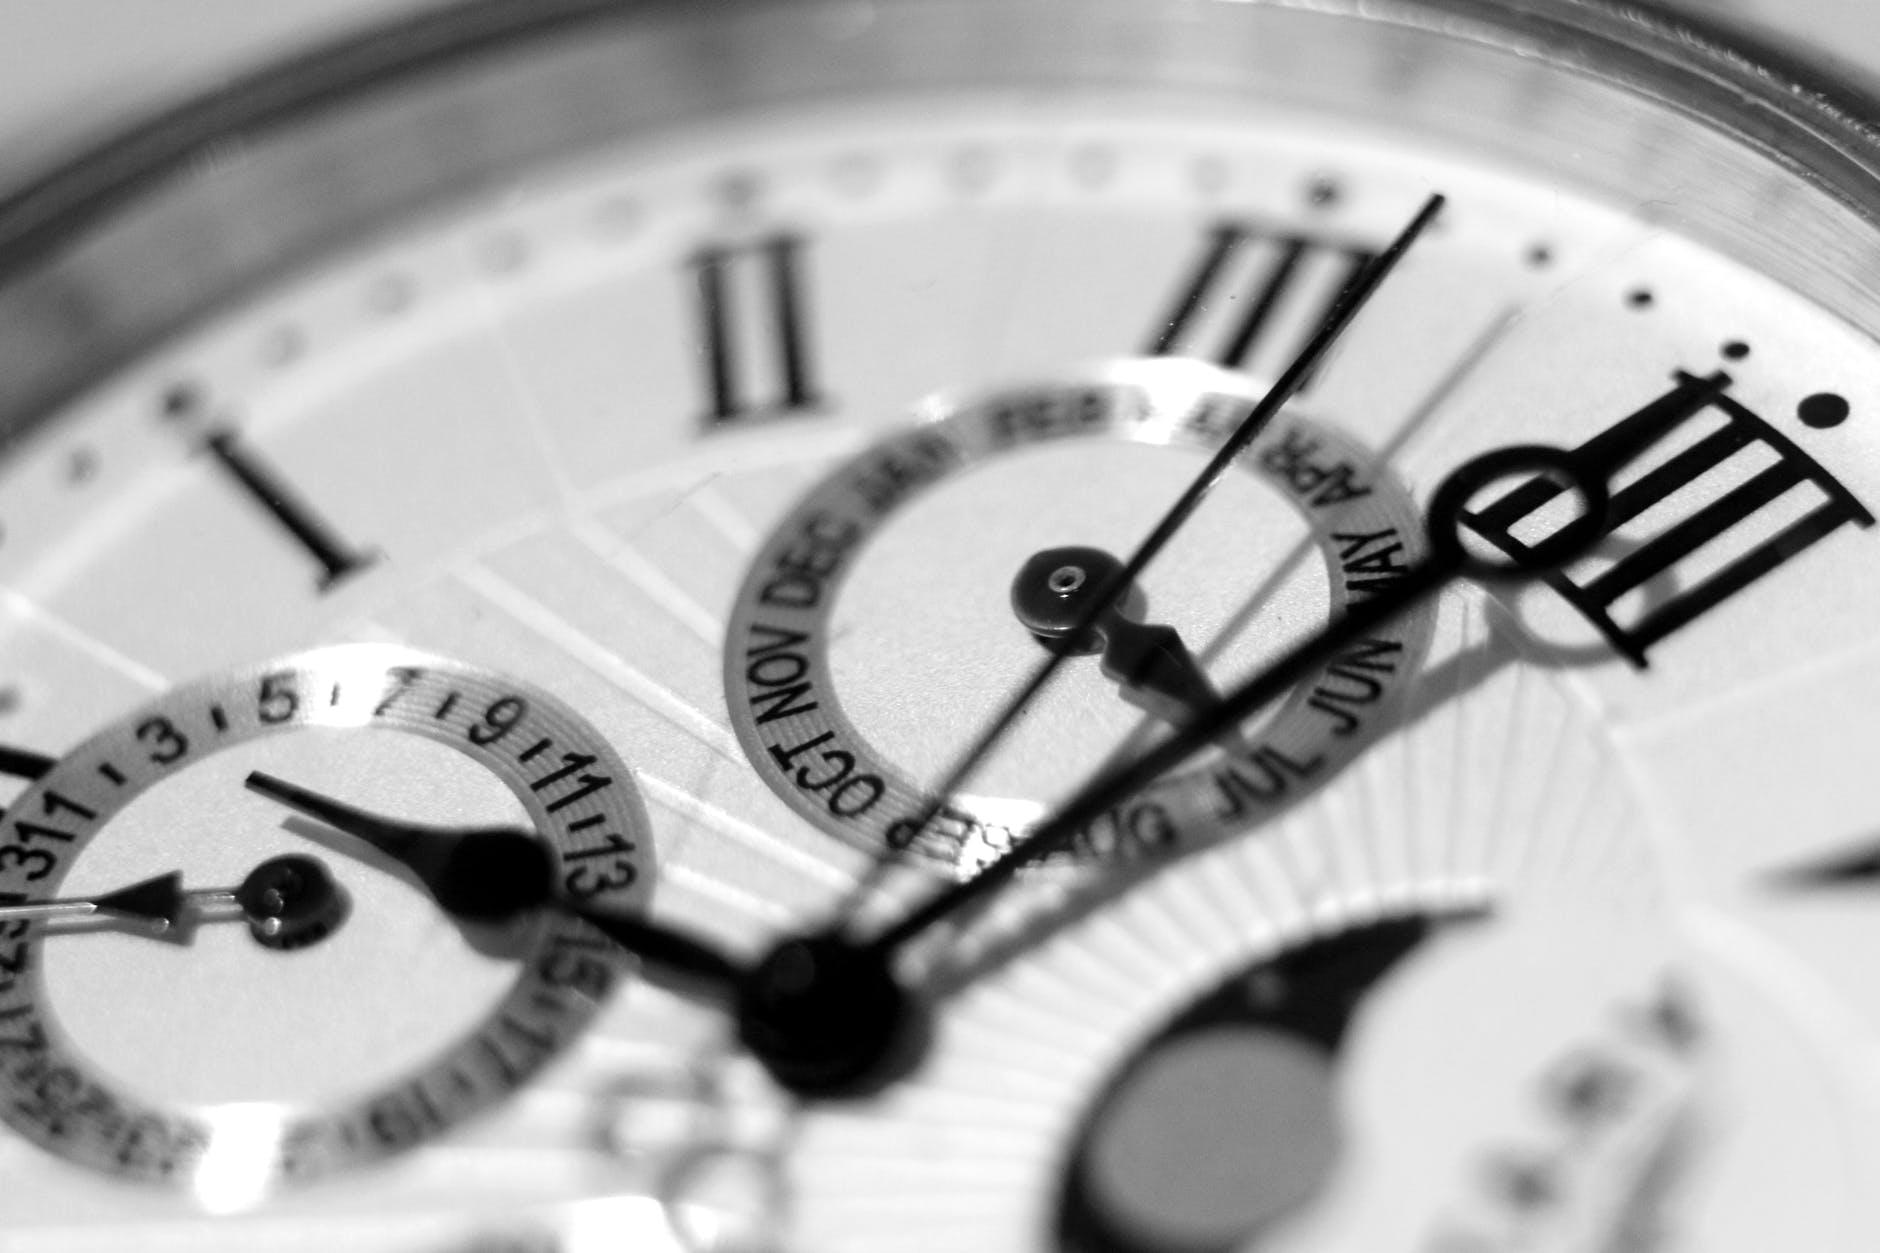 watch repair, repairing watches, watch kit